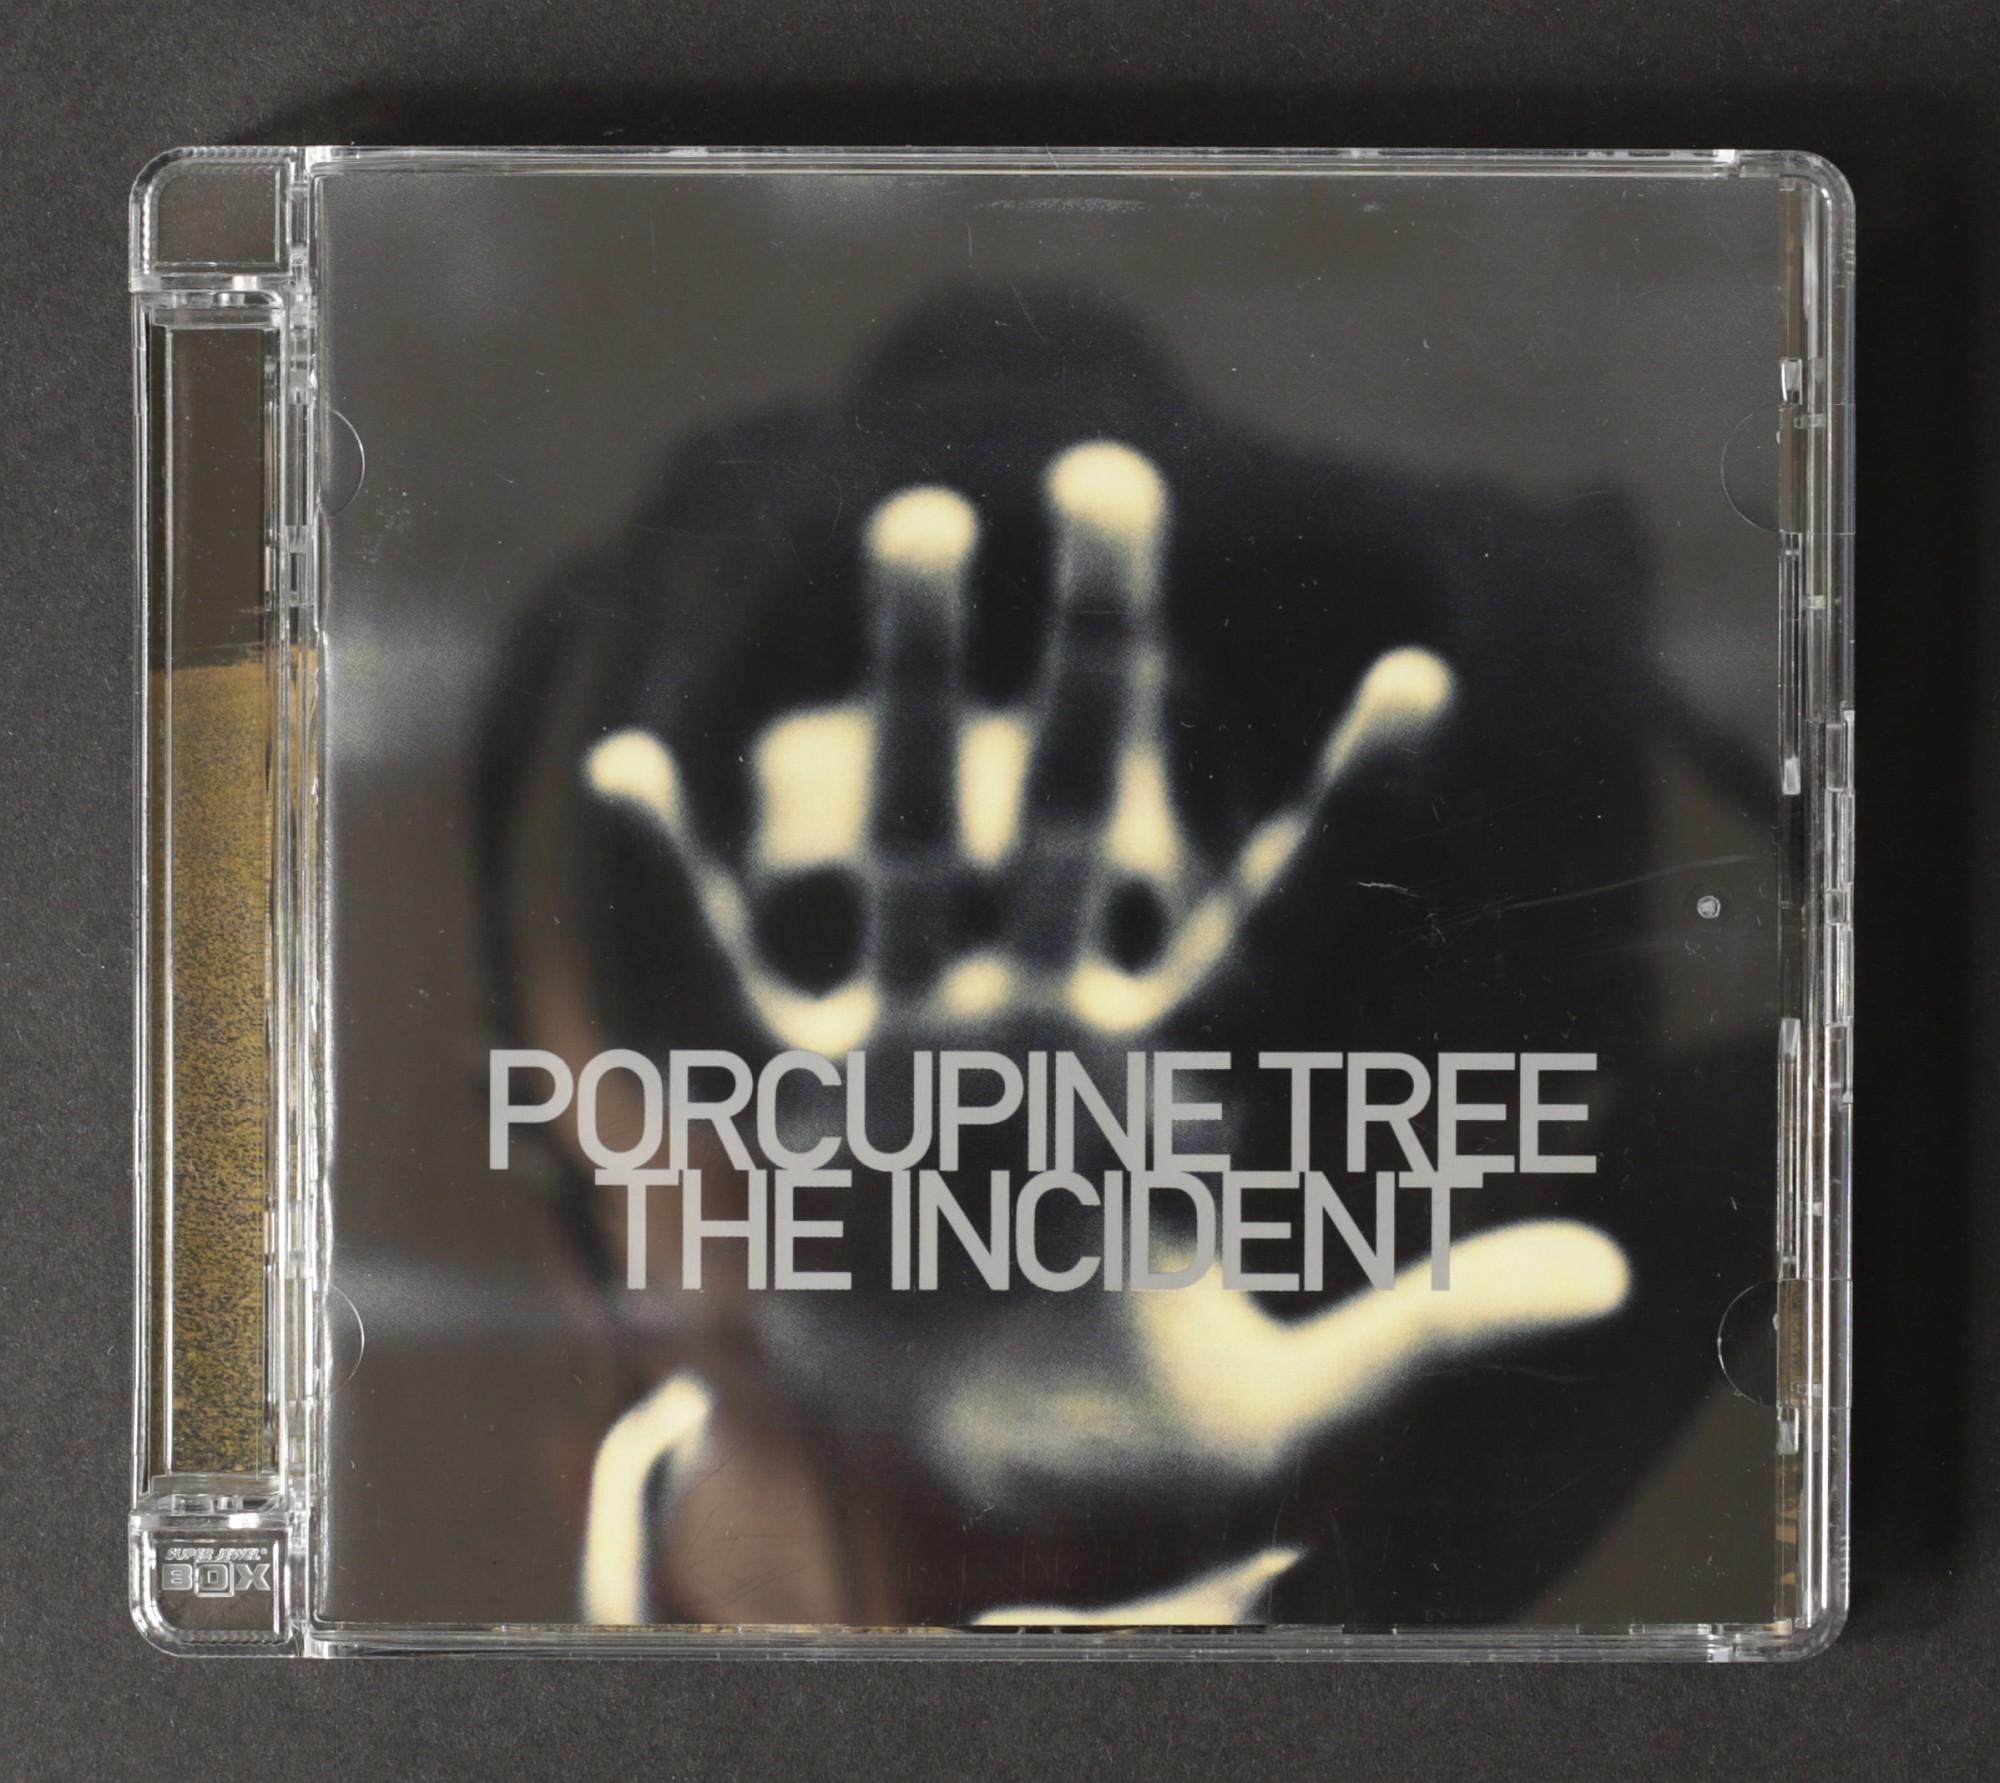 Porcupine Tree The Incident 5.1 Surround Mix DVD Audio